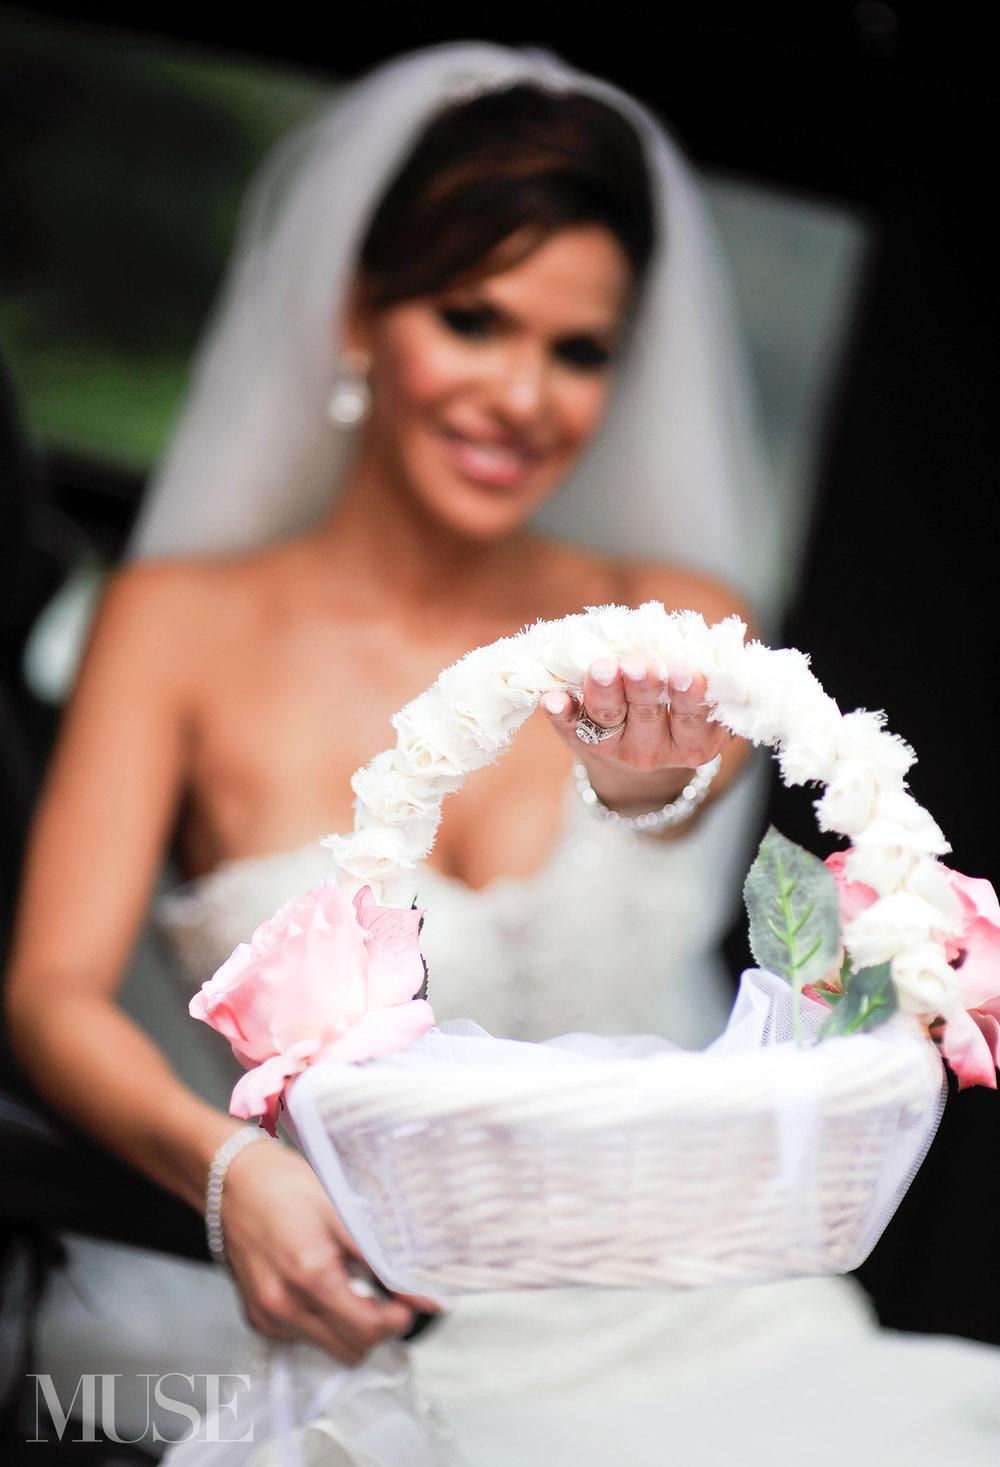 MUSE Bride Erick Rhodes Photography Still Life